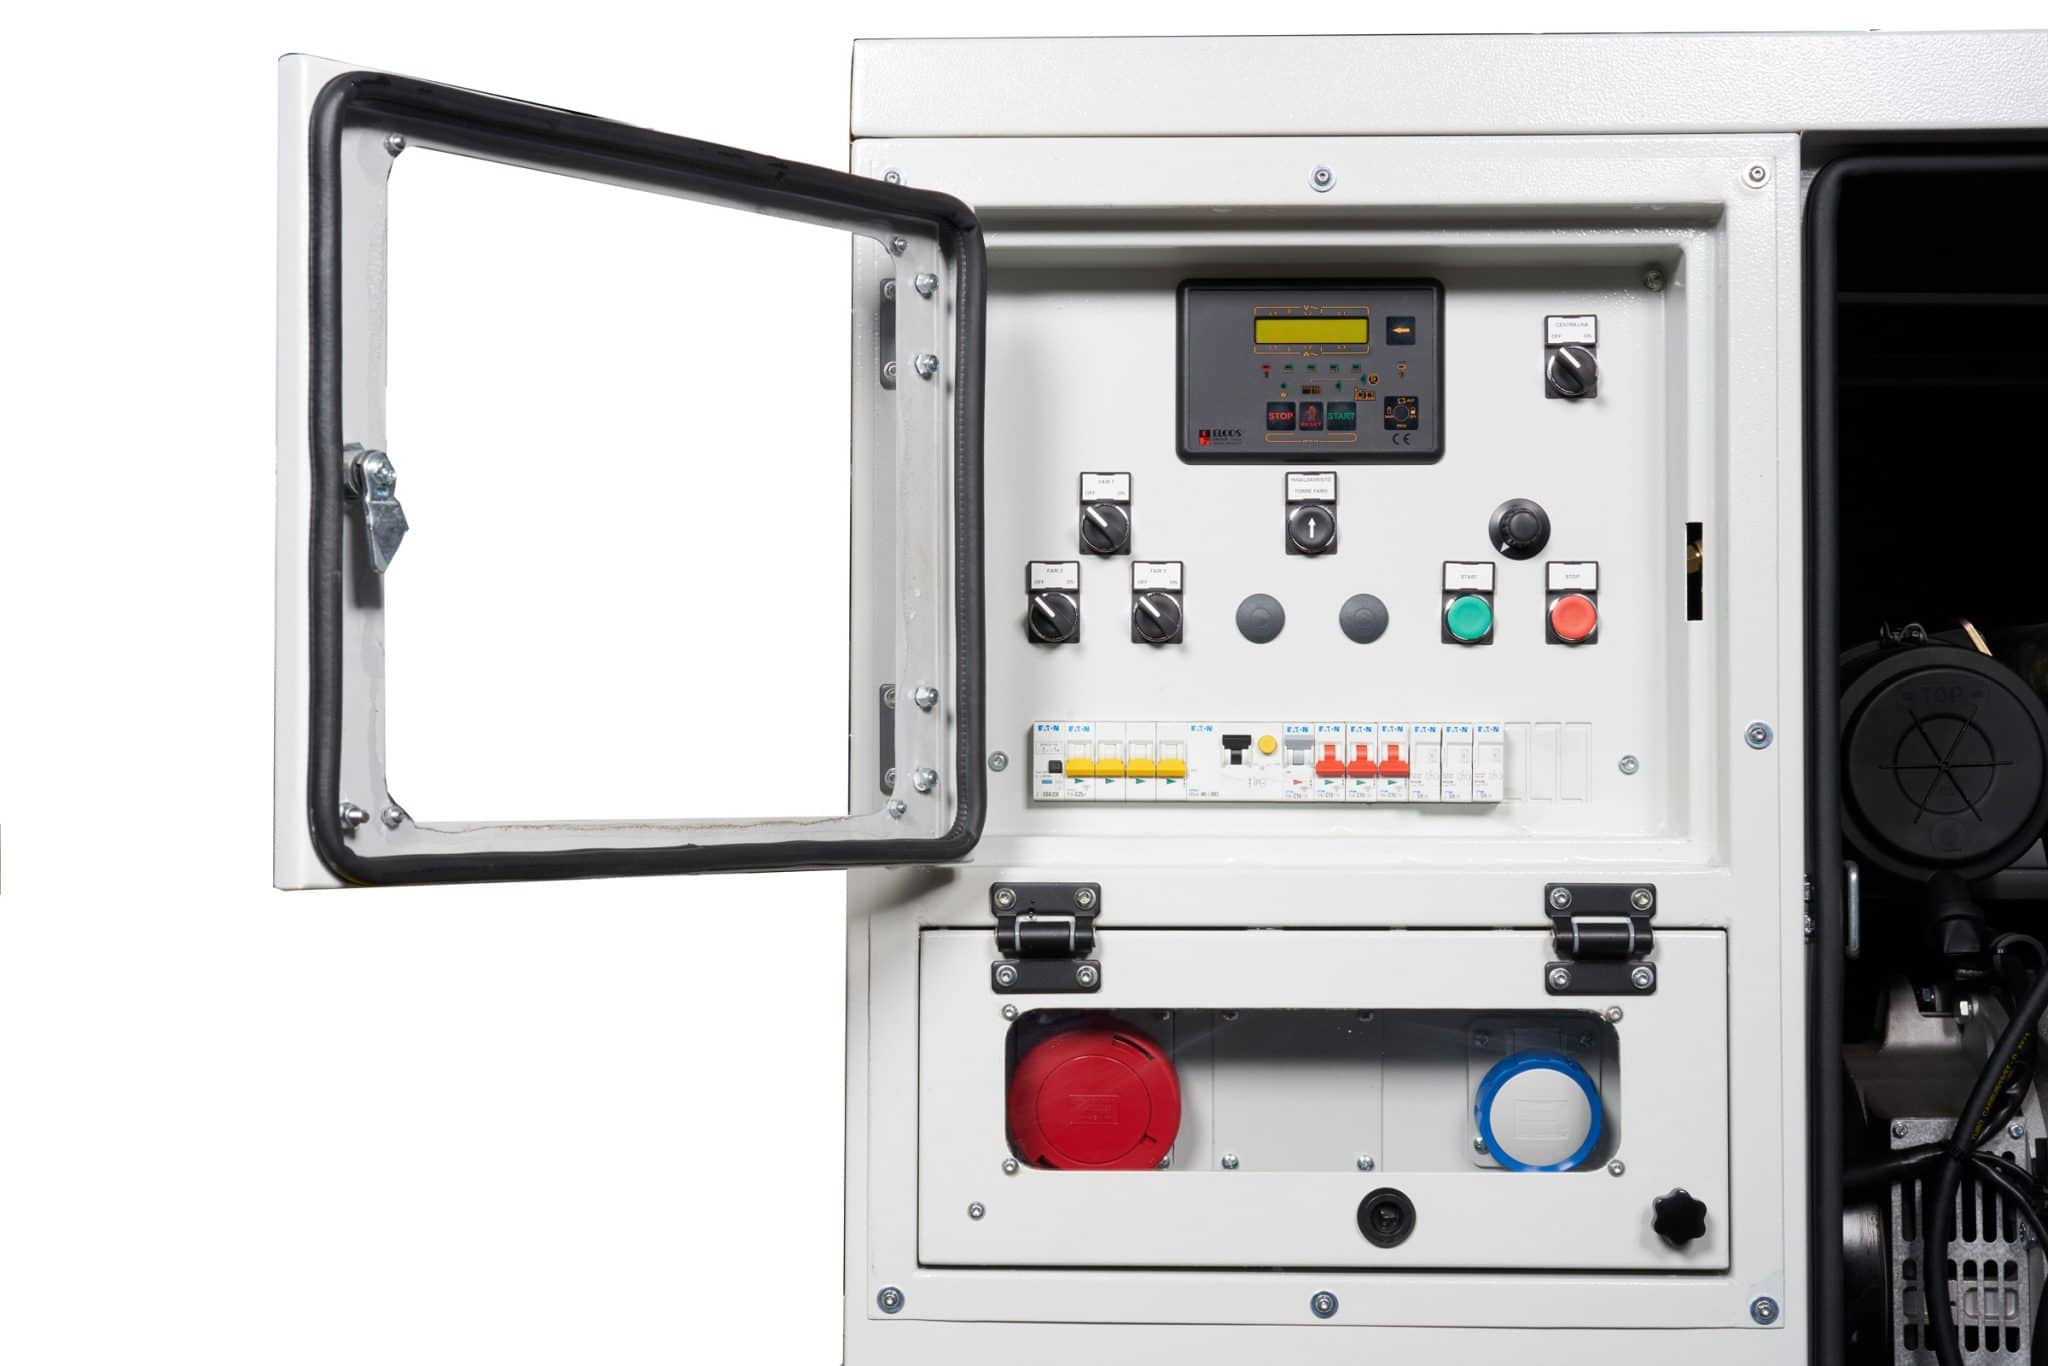 Lampo-control-panel-emergency response trailer unit